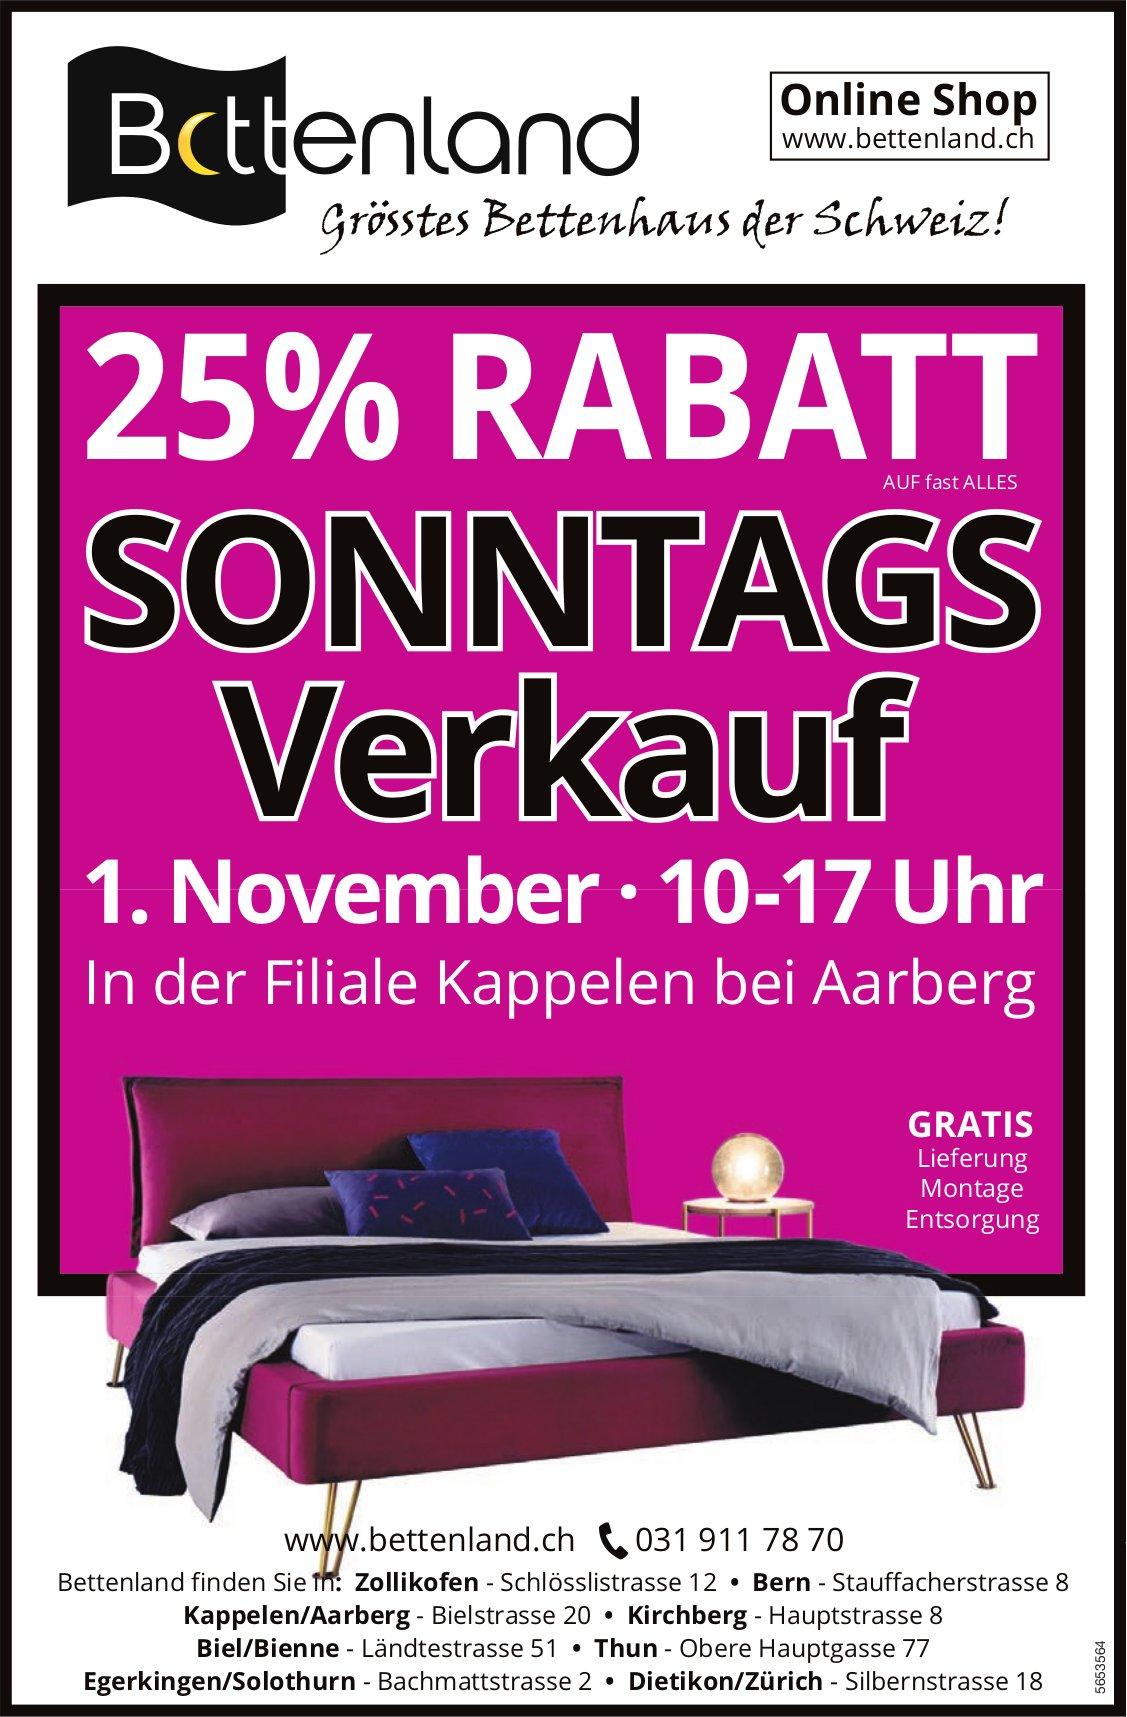 SONNTAGS Verkauf, 25% Rabatt, 1. November, Bettenland, Kappelen/Aarberg